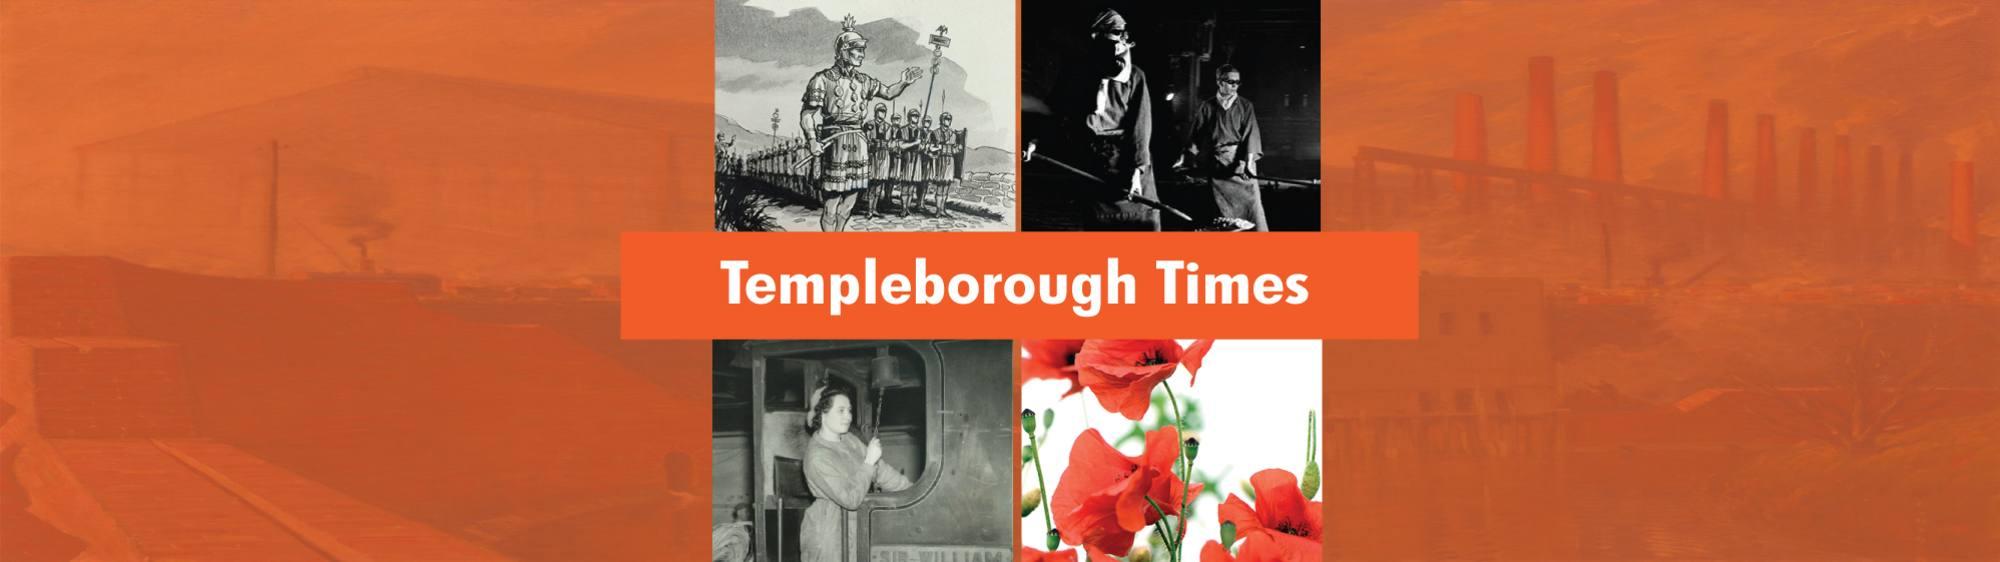 Templeborough Times